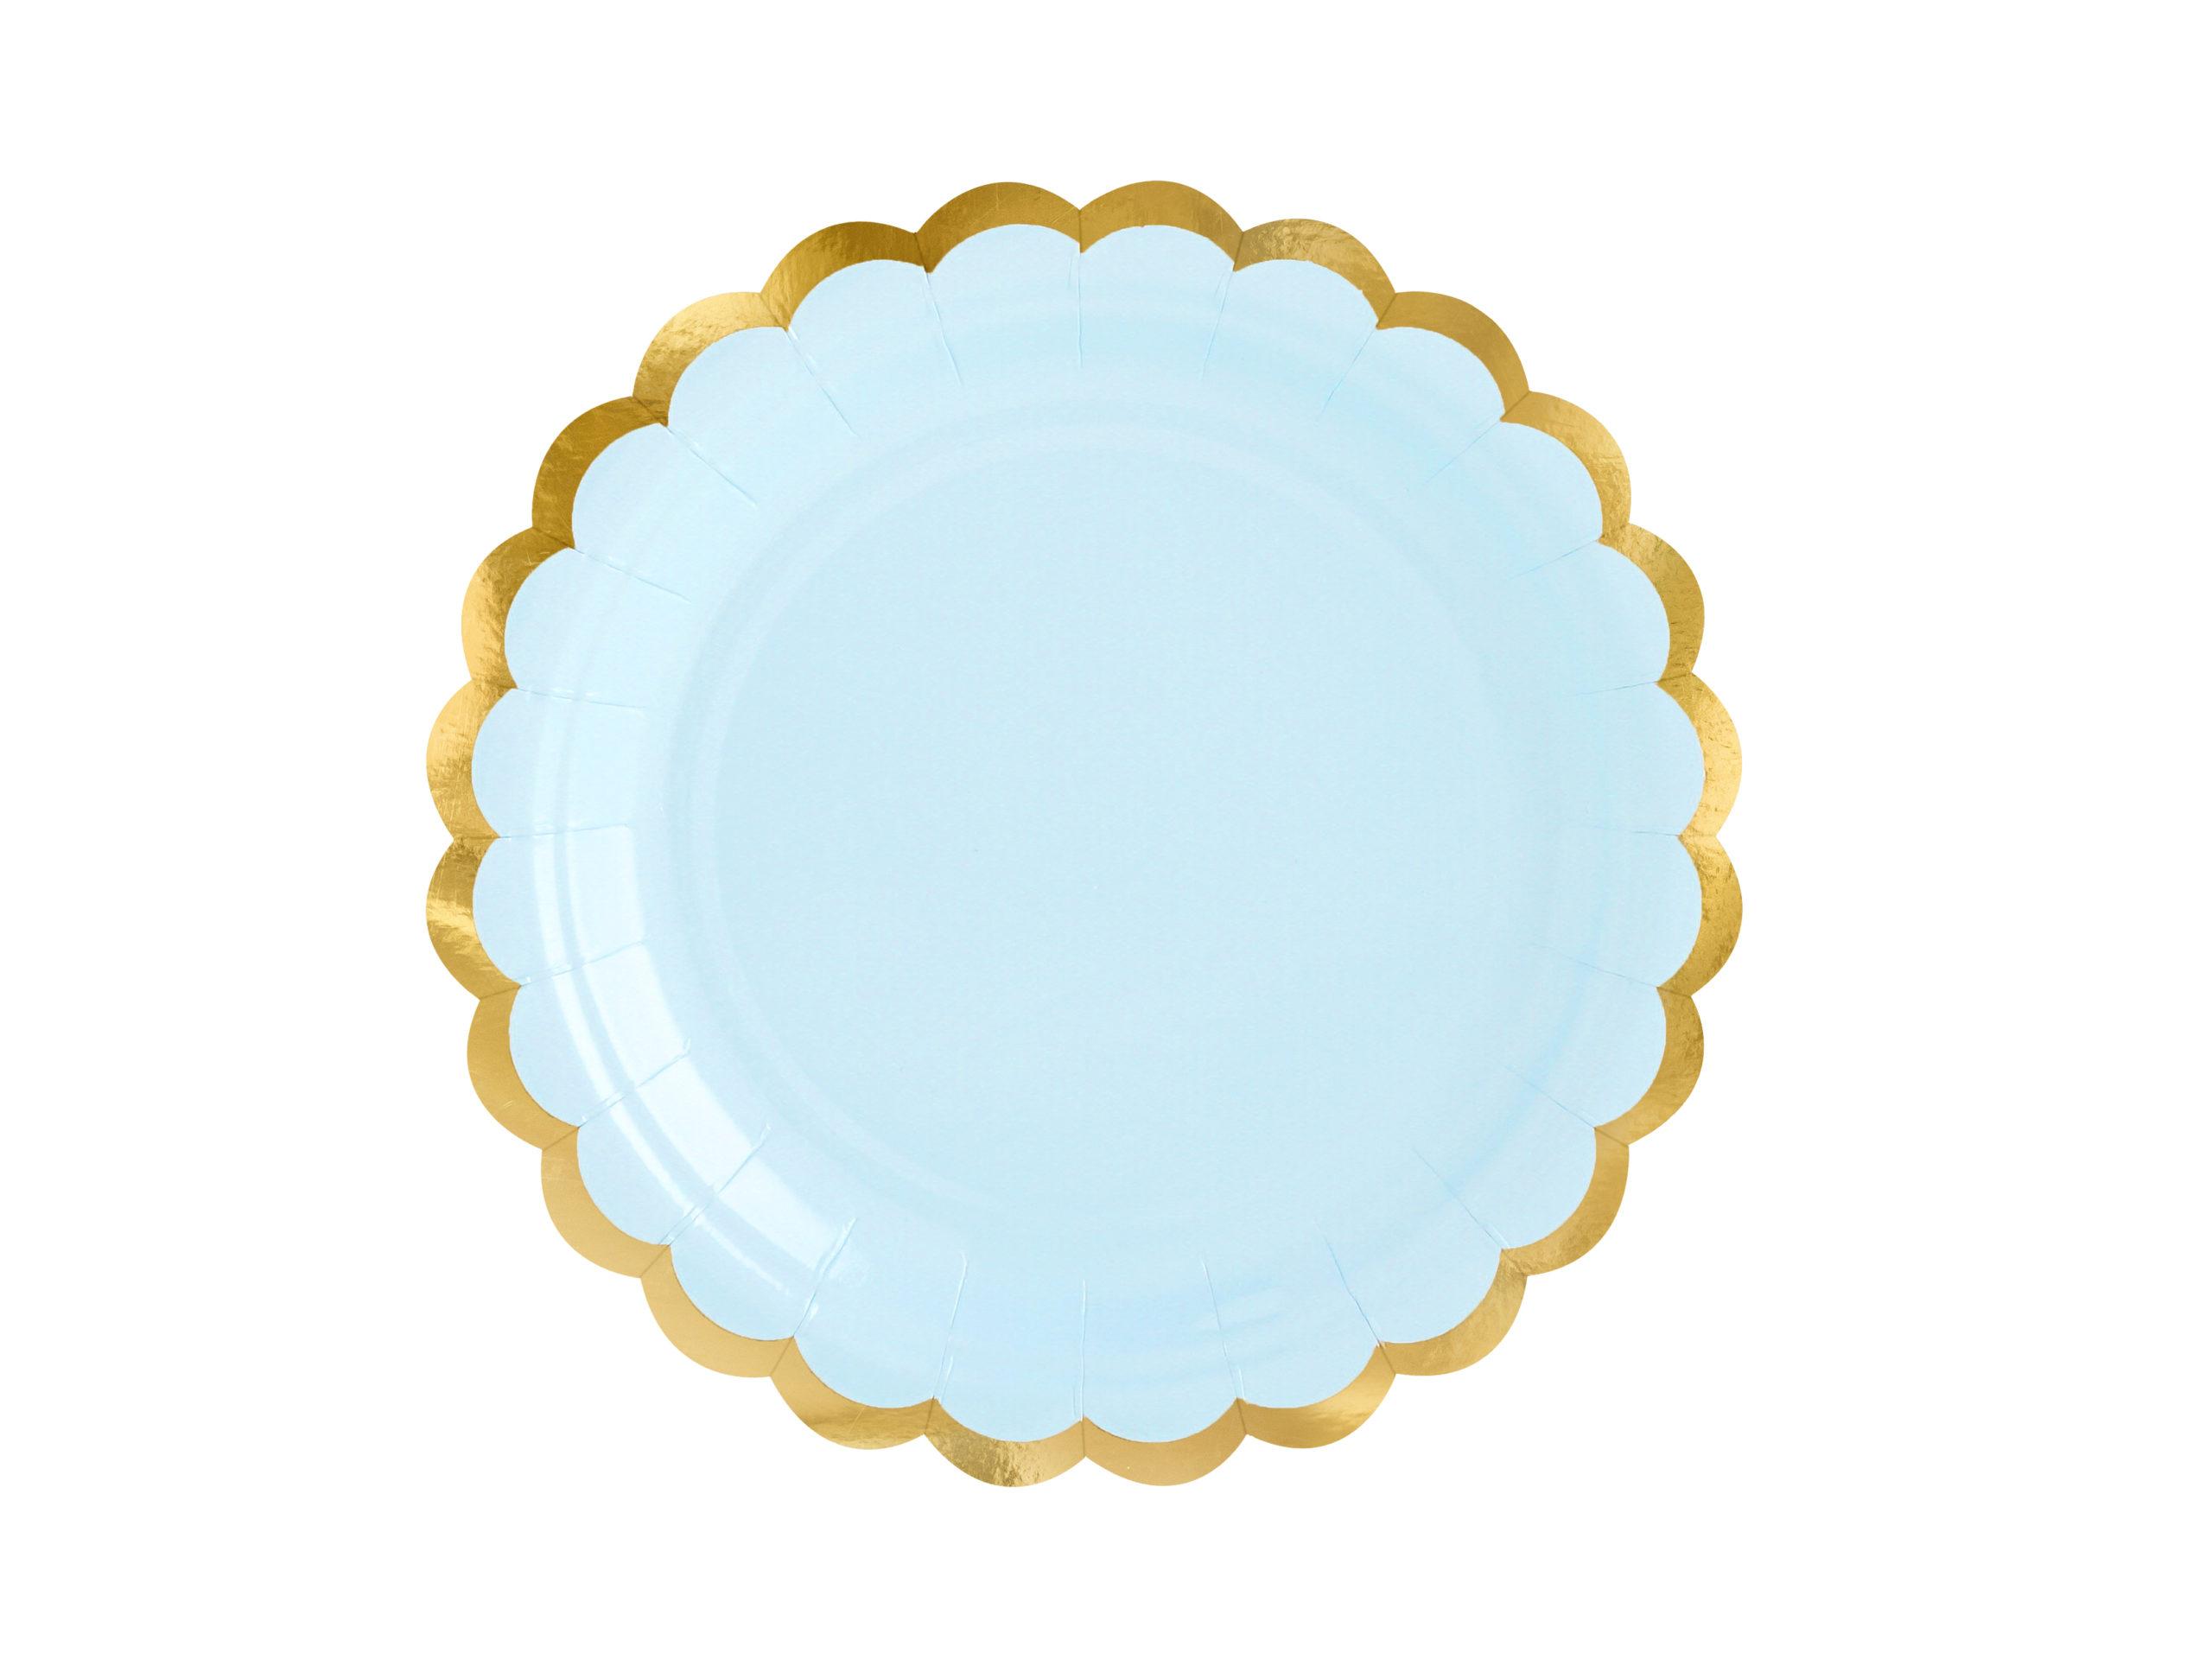 plato azul